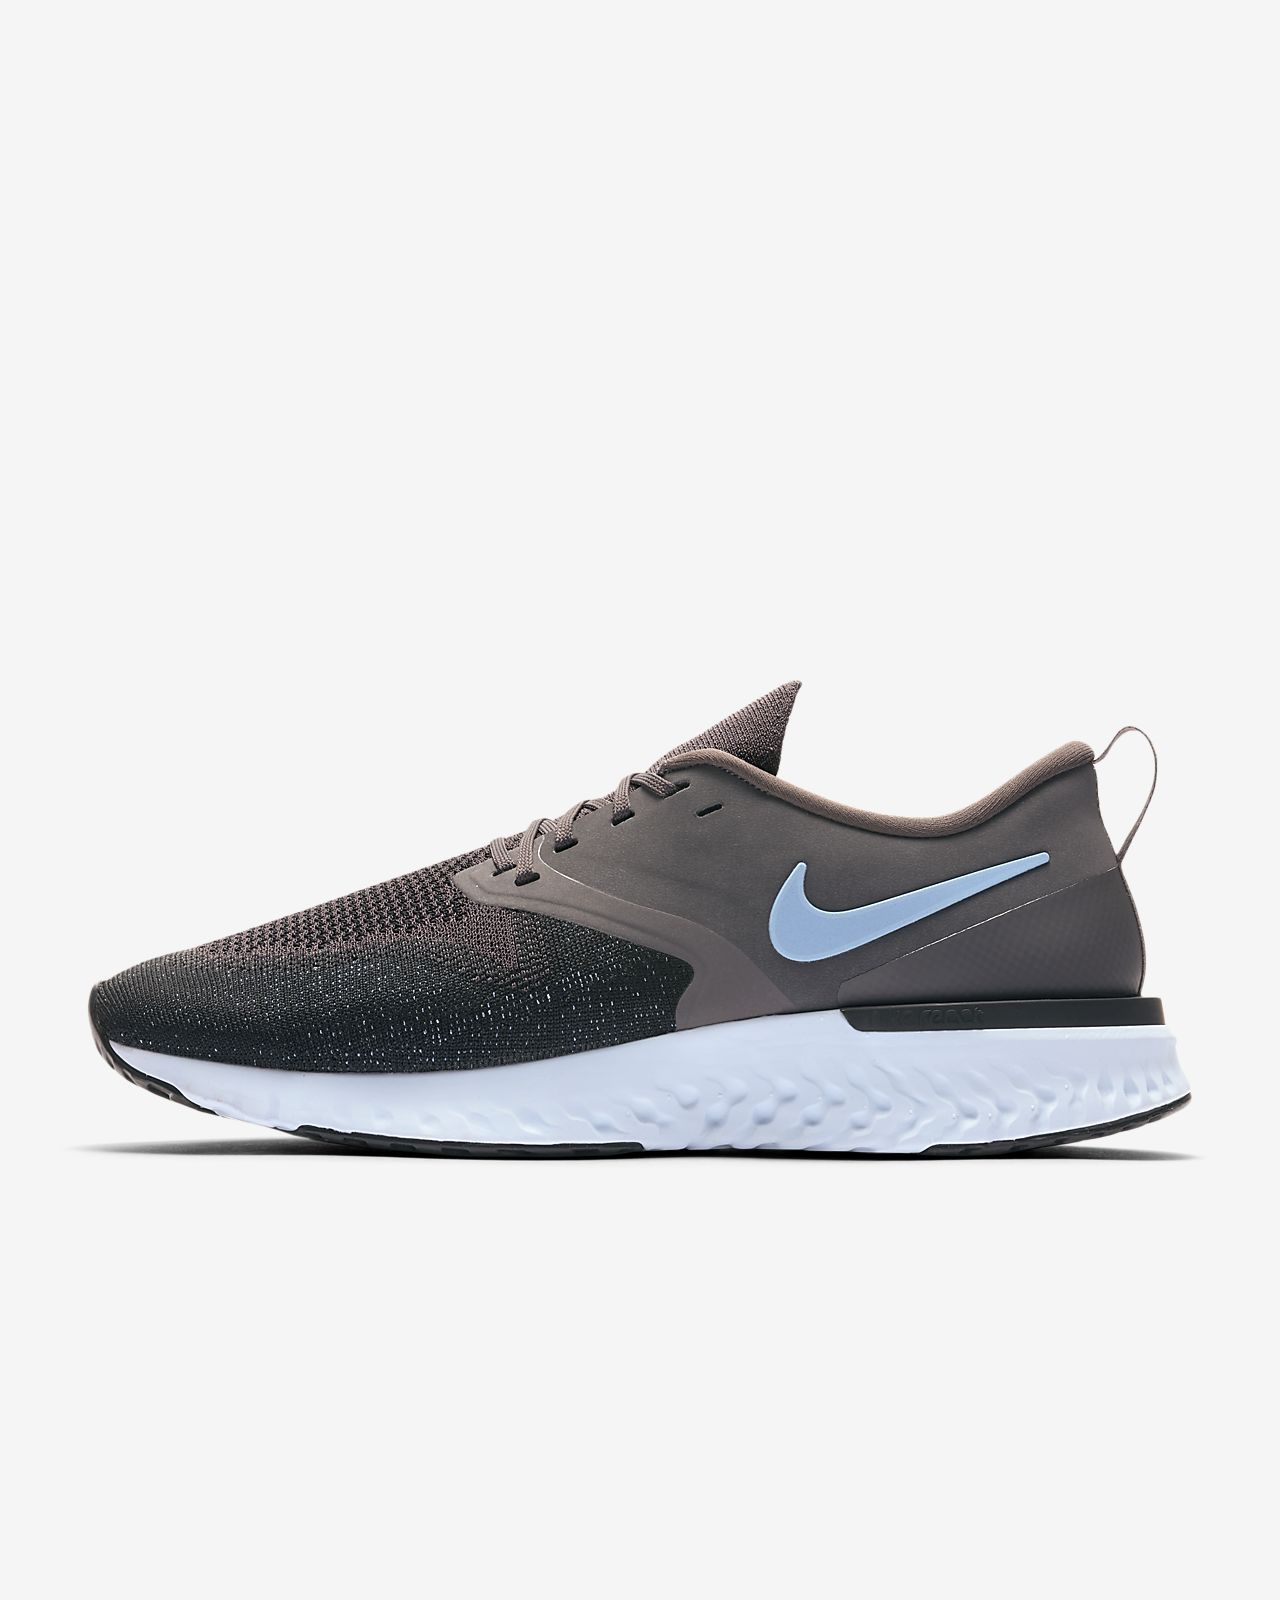 Nike Odyssey React Flyknit 2 Zapatillas de running Hombre